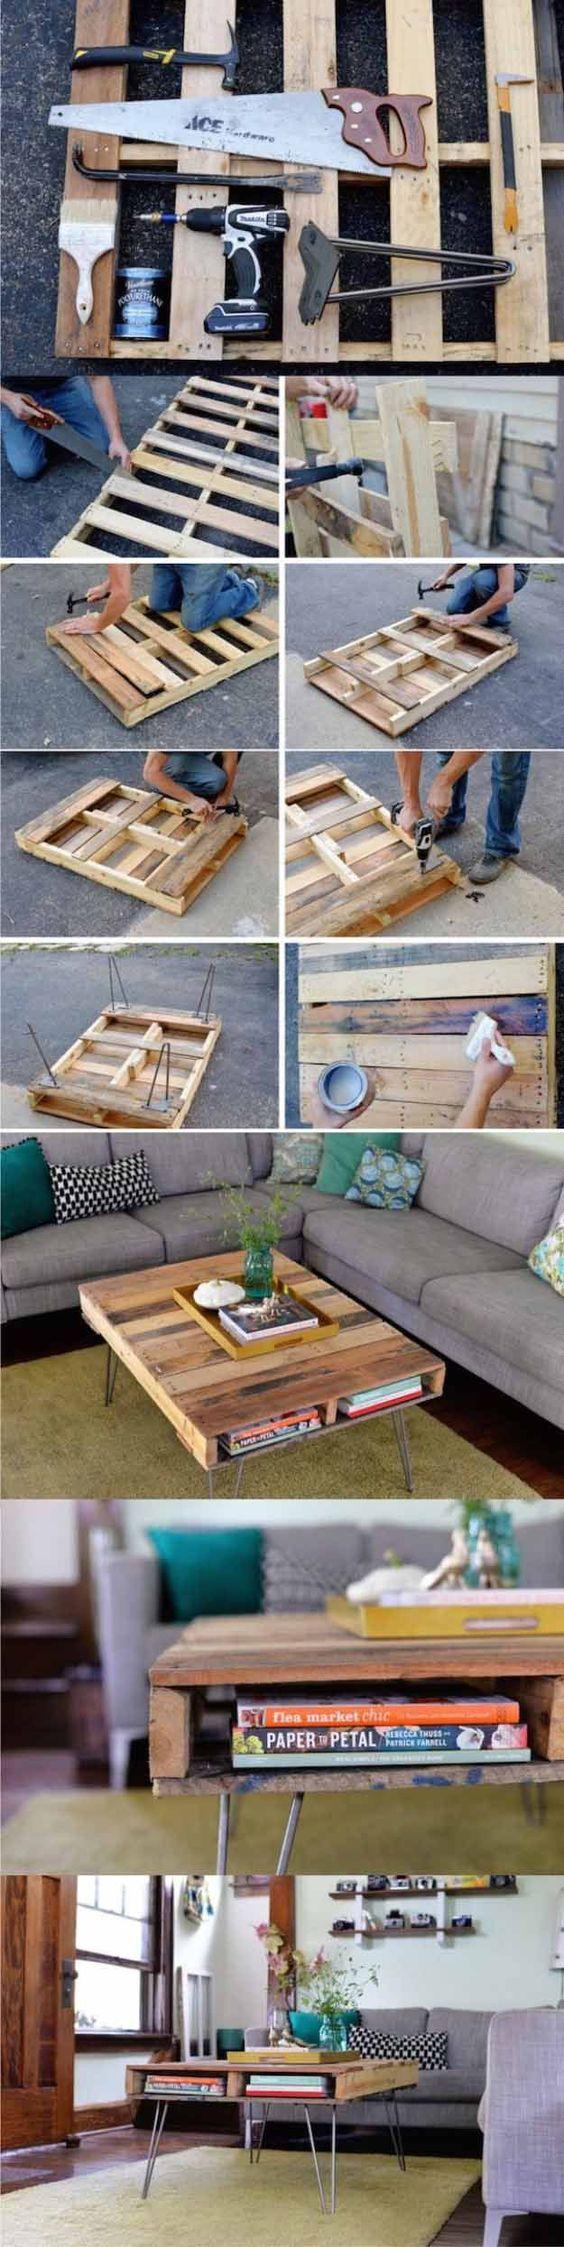 15 Insane DIY Coffee Table Ideas 3